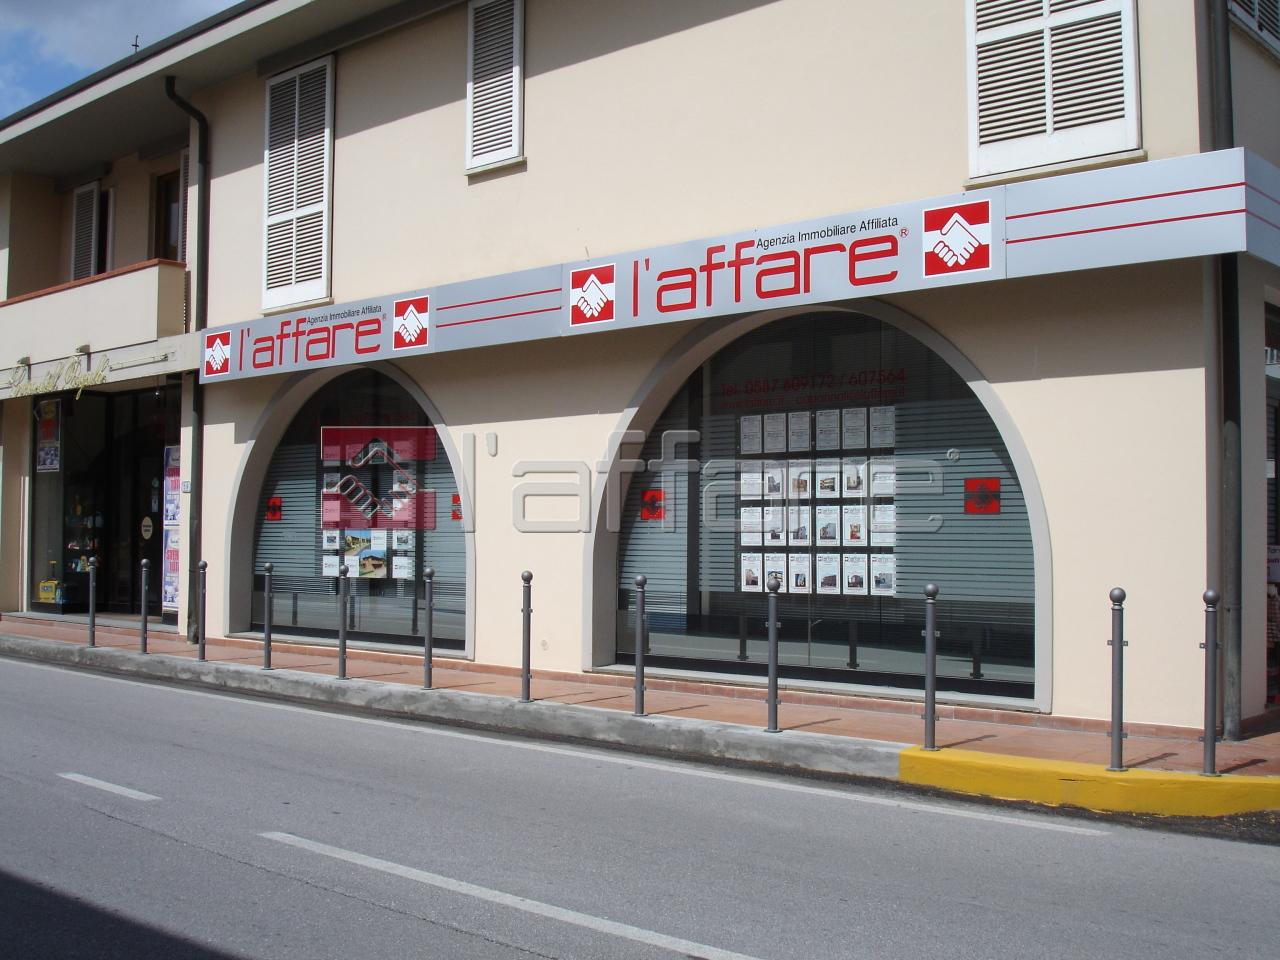 Fondo - Commerciale a Capannoli Rif. 6724273